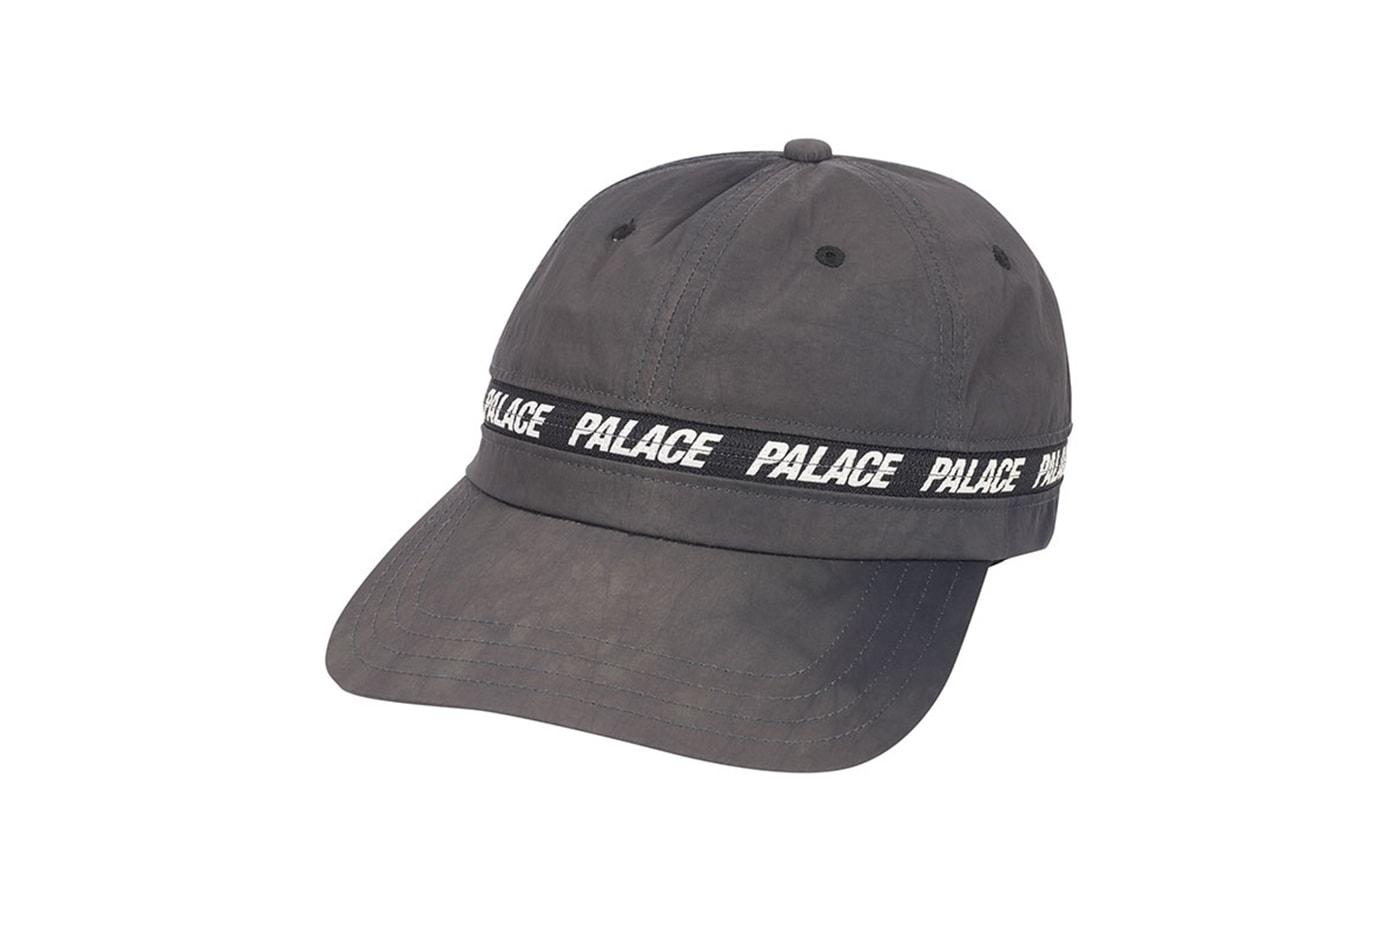 Supreme Palace Spring Summer 2019 Drop List Week 7 8 Jean Paul Gaultier Siberia Hills Balenciaga Y-3 NEIGHBORHOOD READYMADE UNUSED